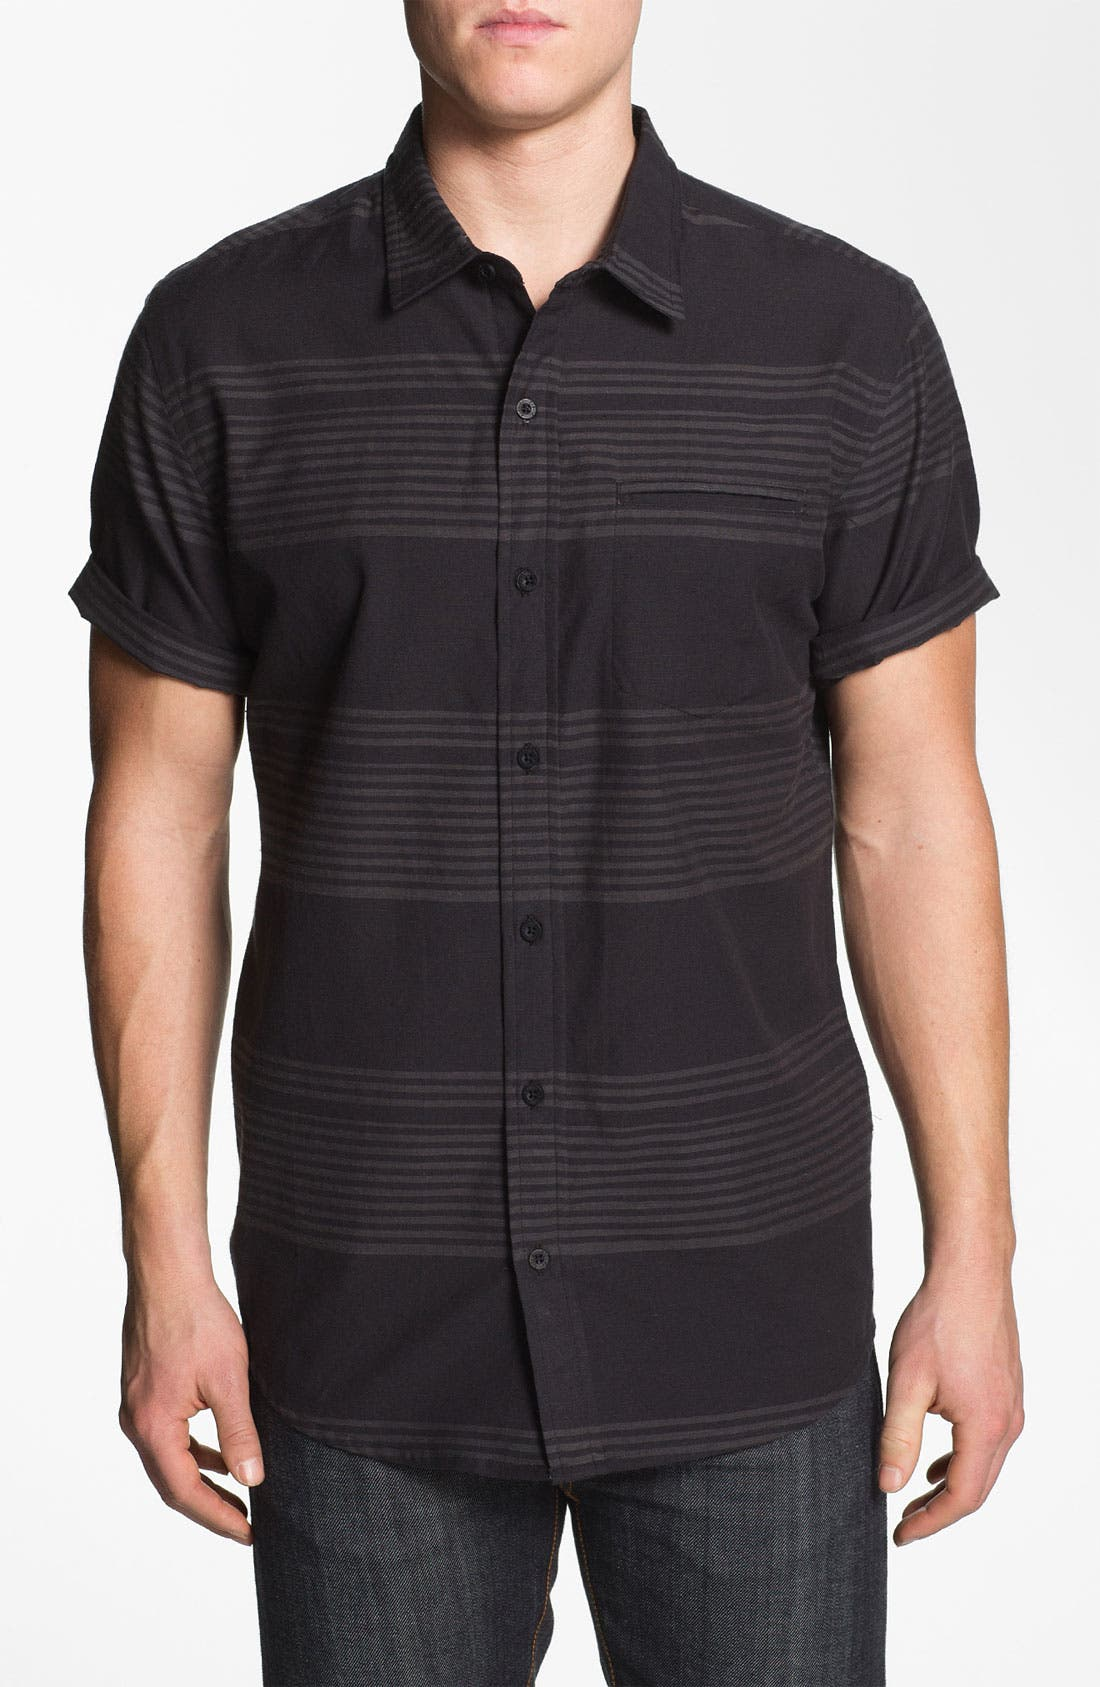 Alternate Image 1 Selected - Ezekiel 'Clampett' Stripe Woven Shirt